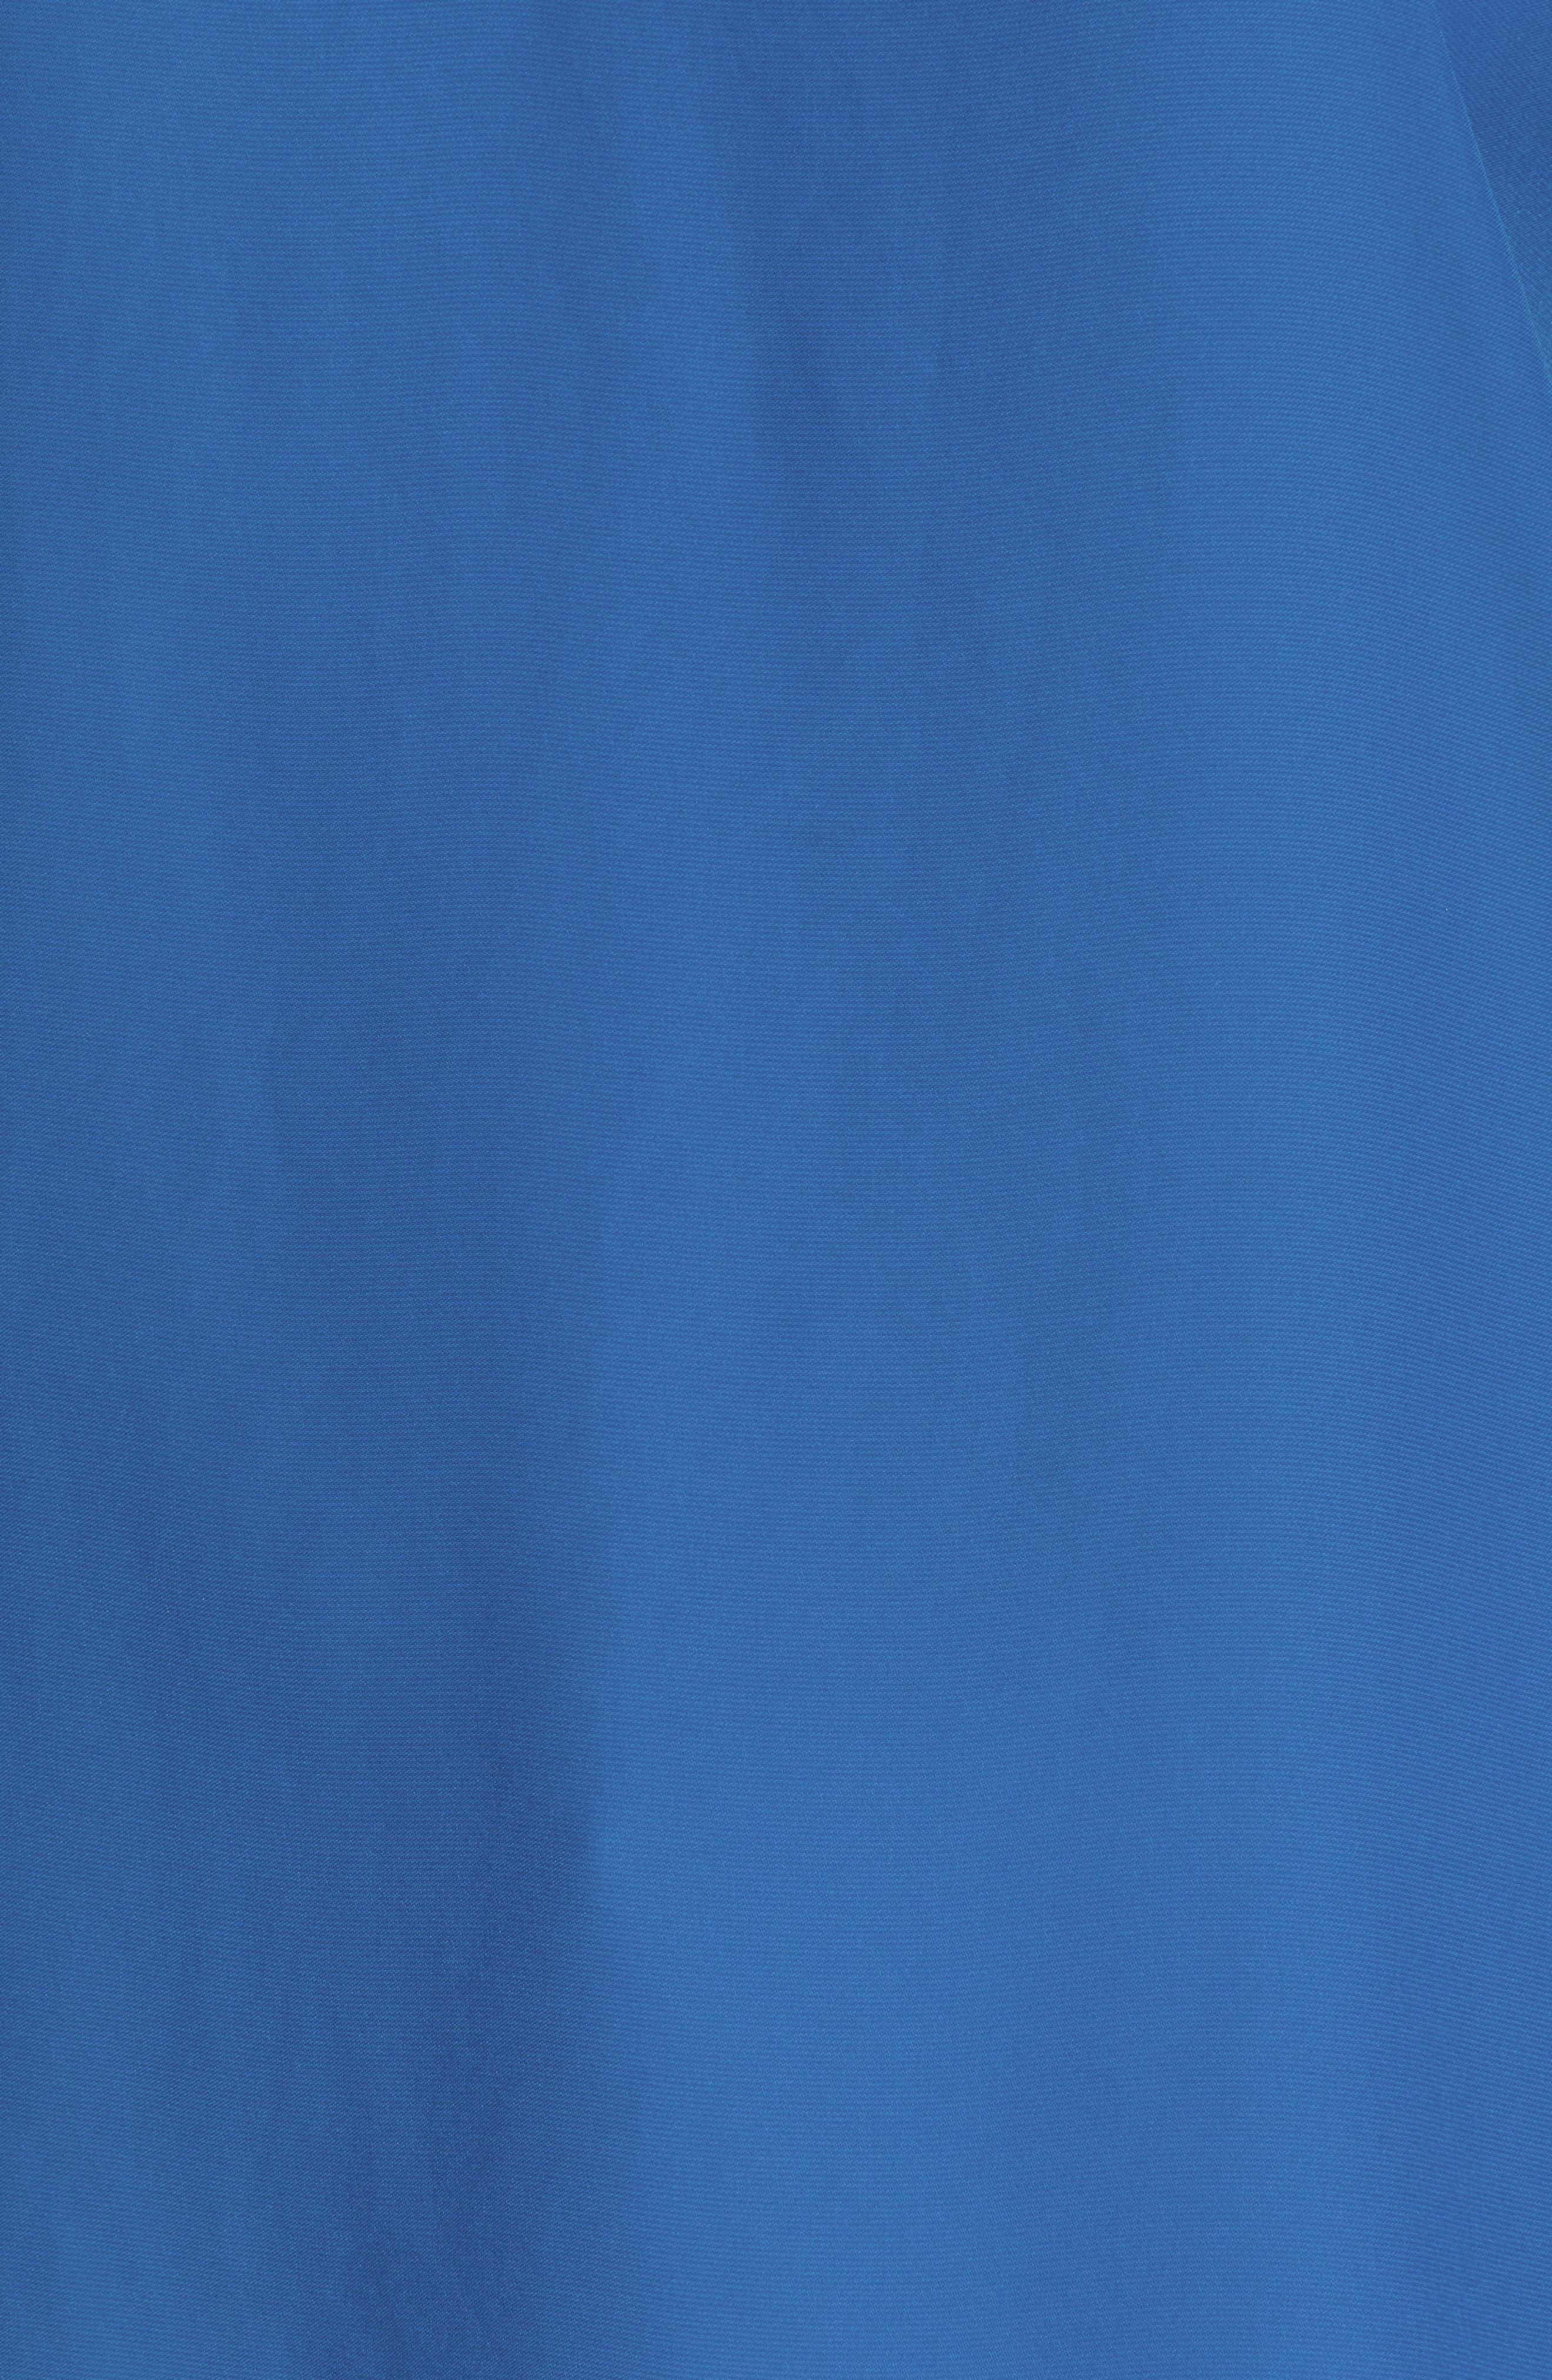 Camisole,                             Alternate thumbnail 5, color,                             Snorkel Blue